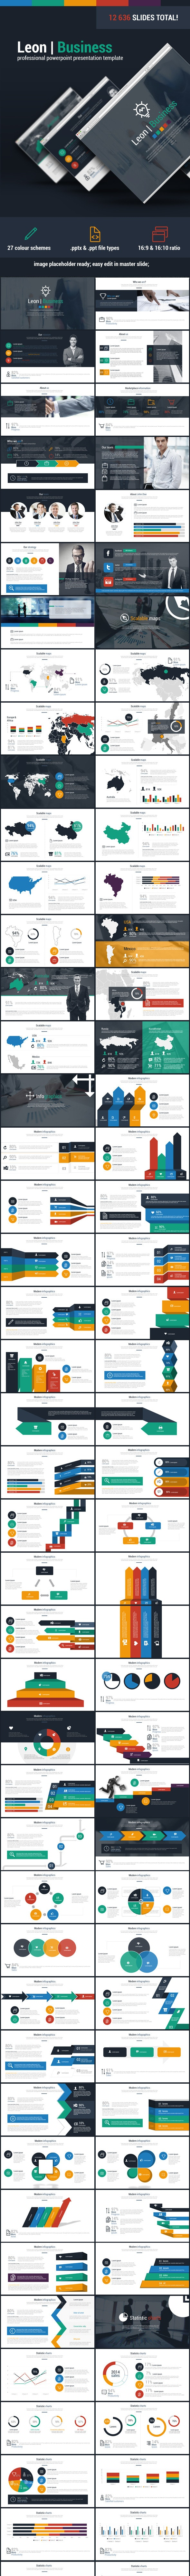 Leon Business Powerpoint Presentation Template - Business PowerPoint Templates